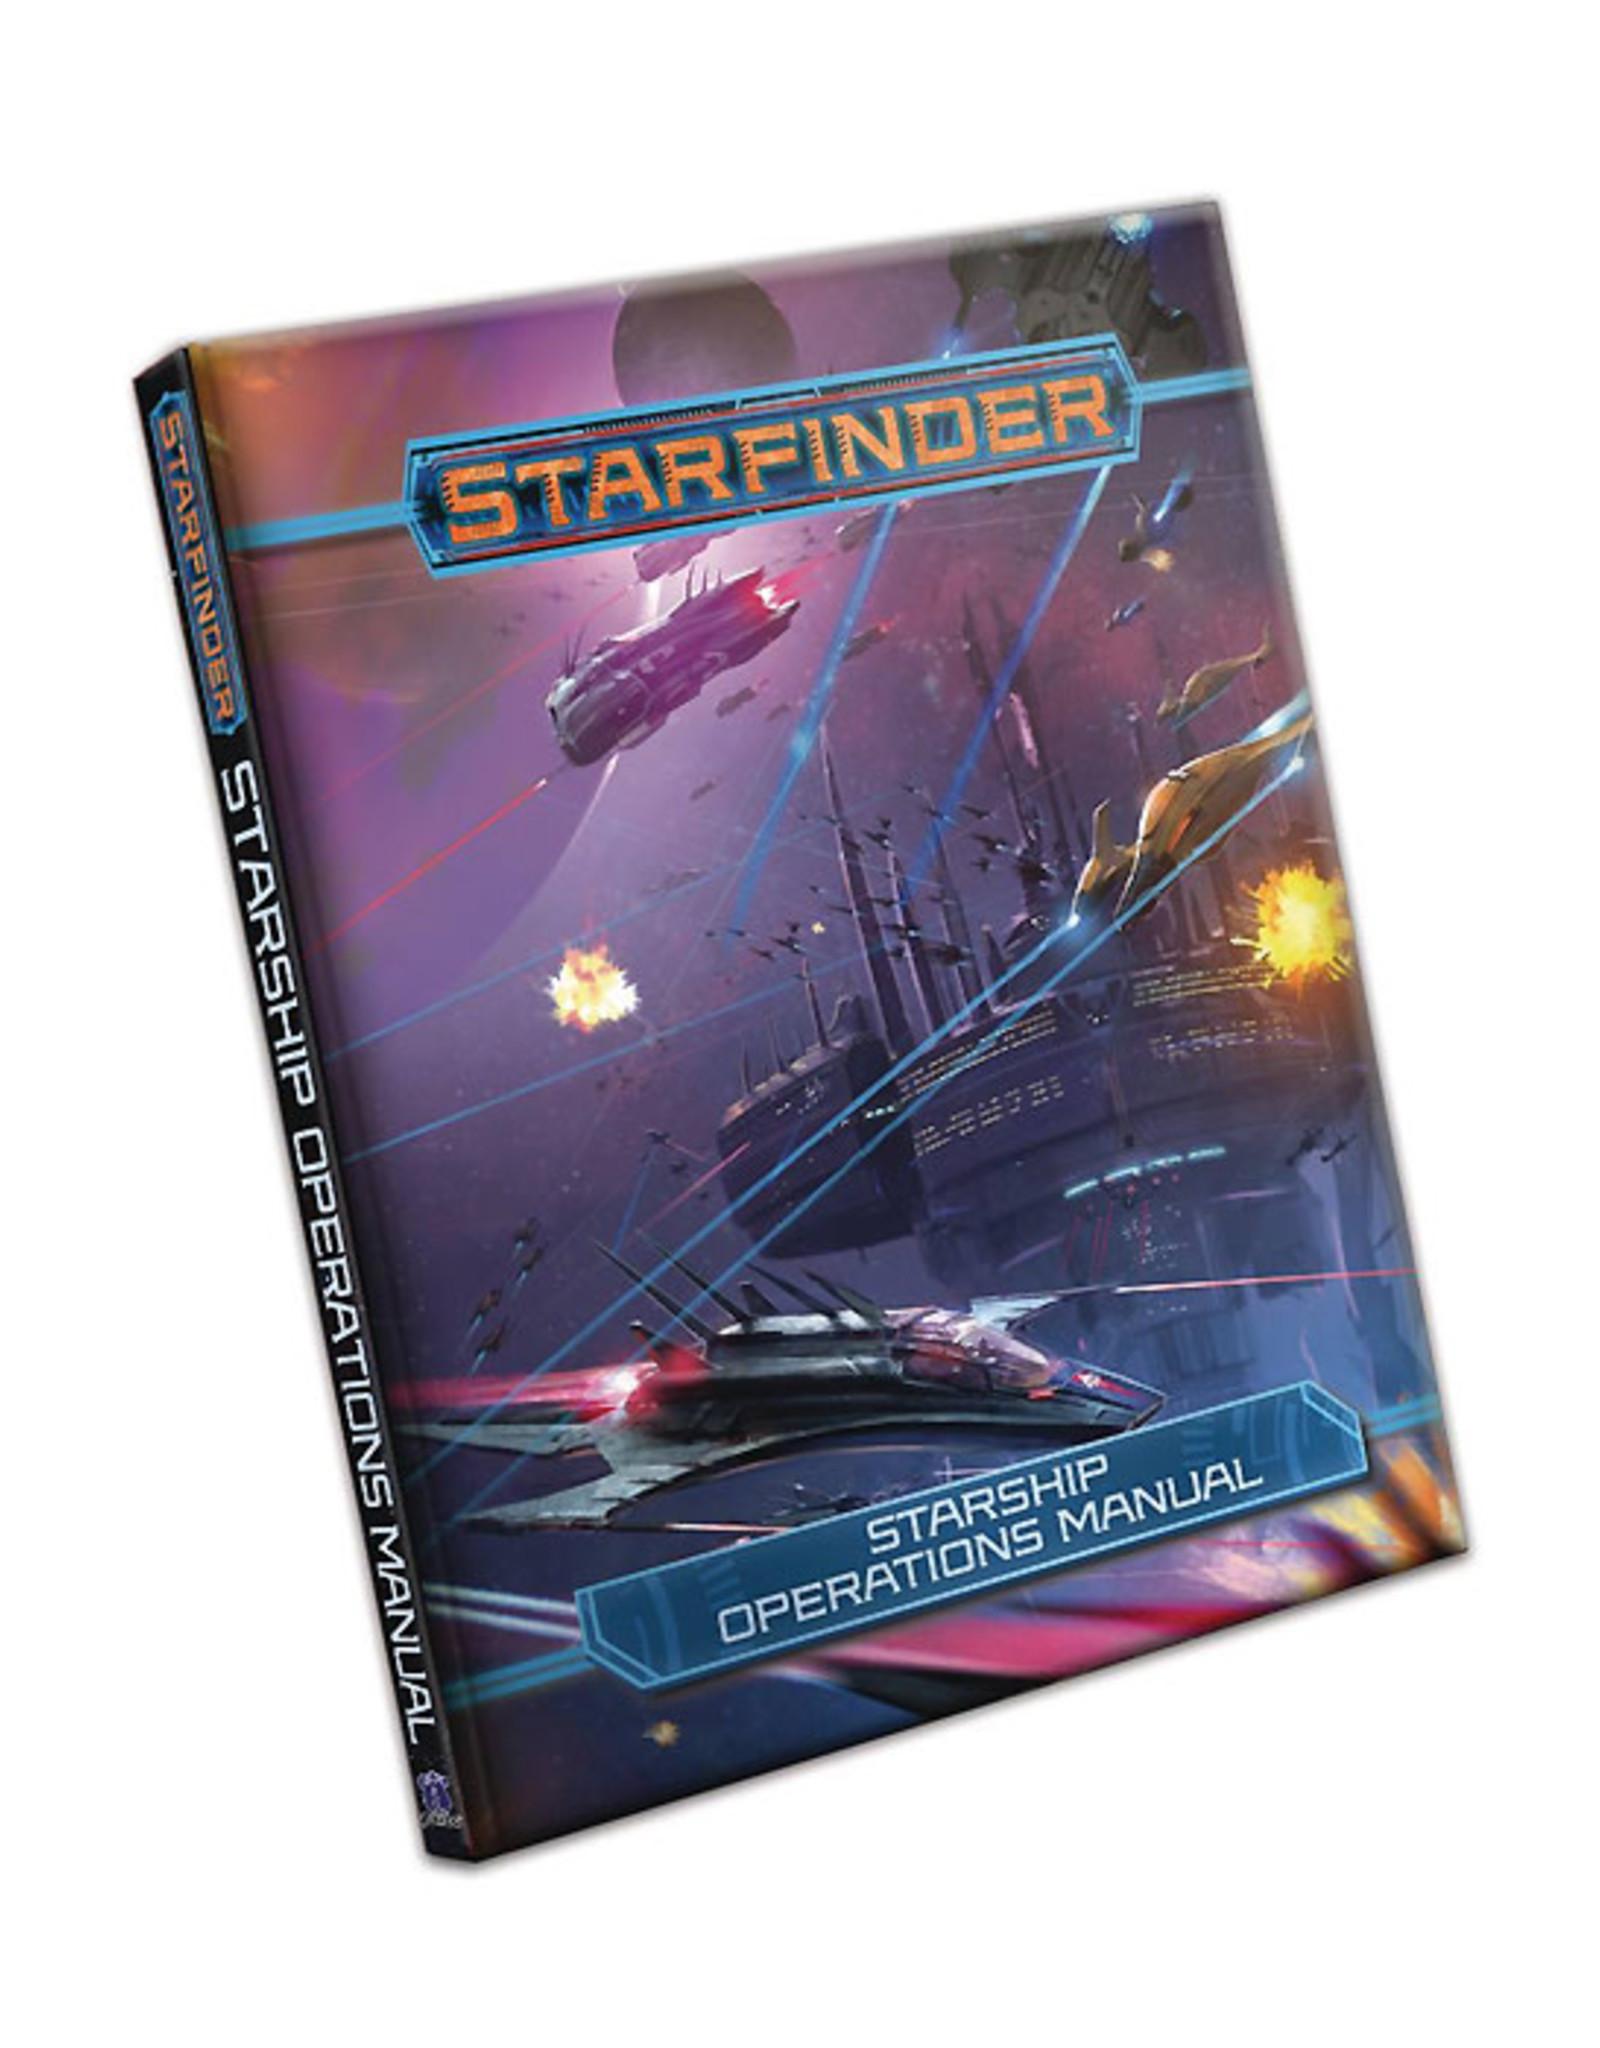 Starfinder Starfinder: Starship Operations Manual